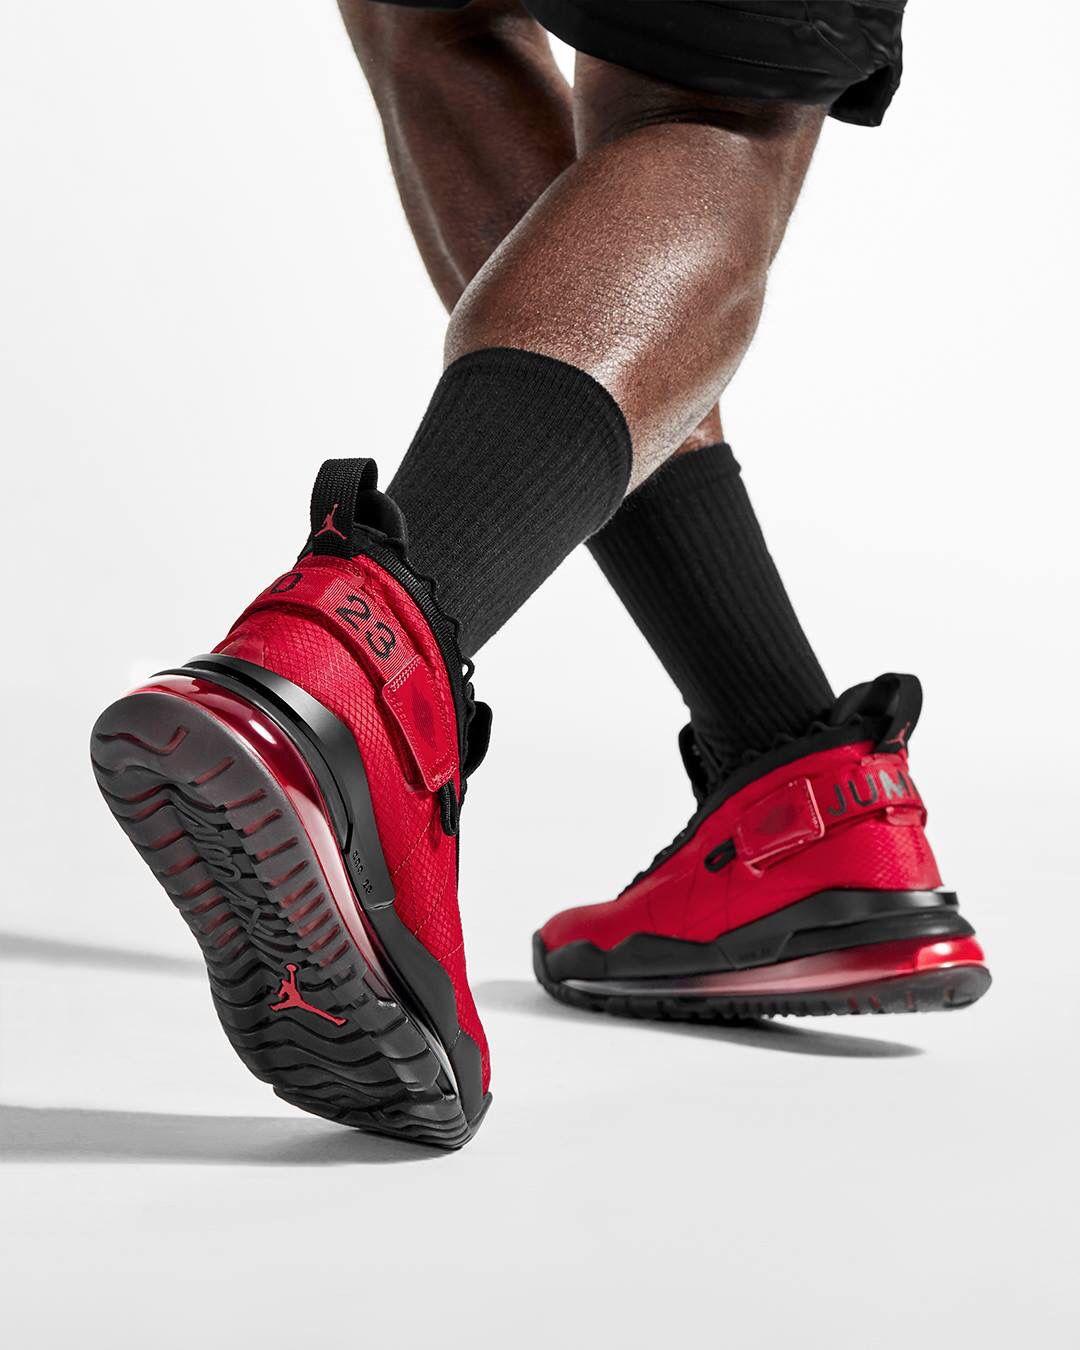 Nike Air Jordan Proto Max 720 | Air